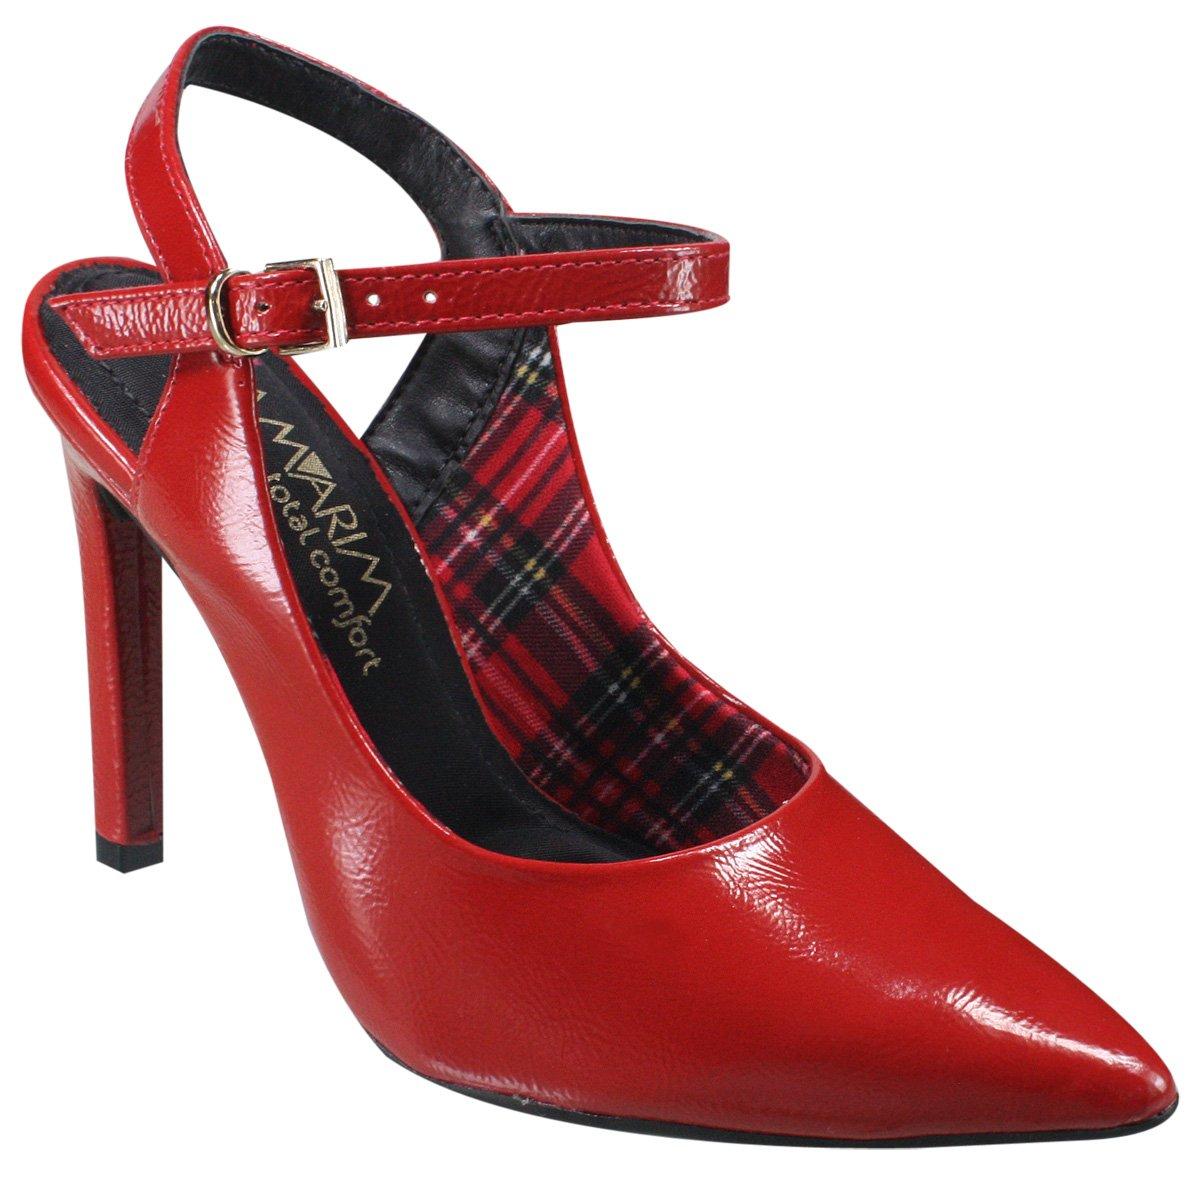 fdbc648132 Sapato Feminino Ramarim Total Comfort 18-94101 000001 Vermelho (Verniz Show  Plus)